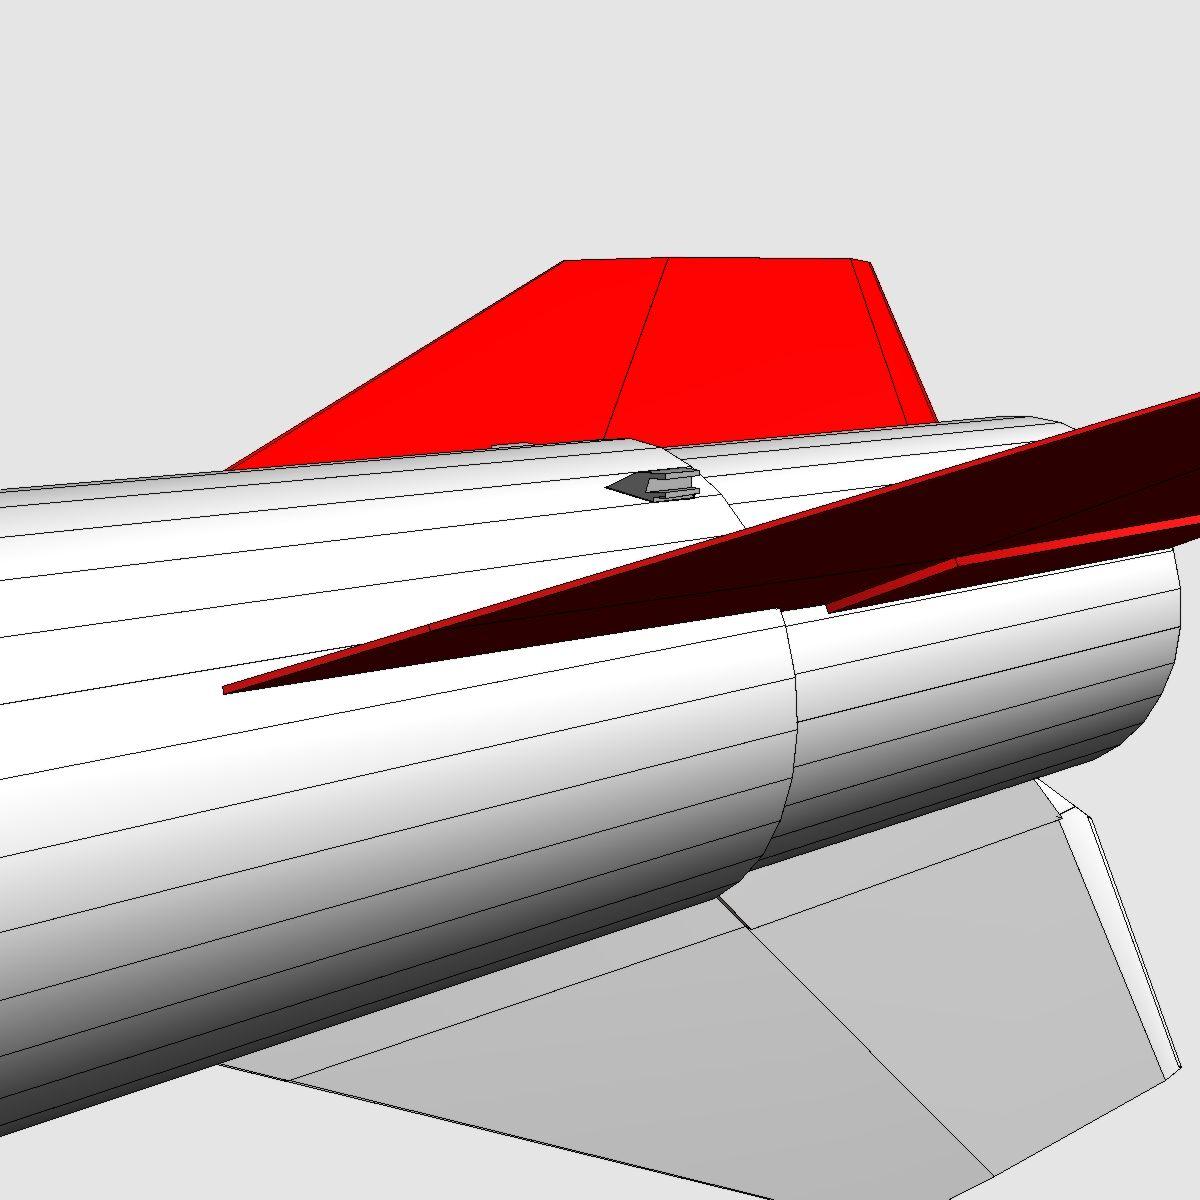 black brant vb sounding rocket 3d model 3ds dxf cob x obj 150878